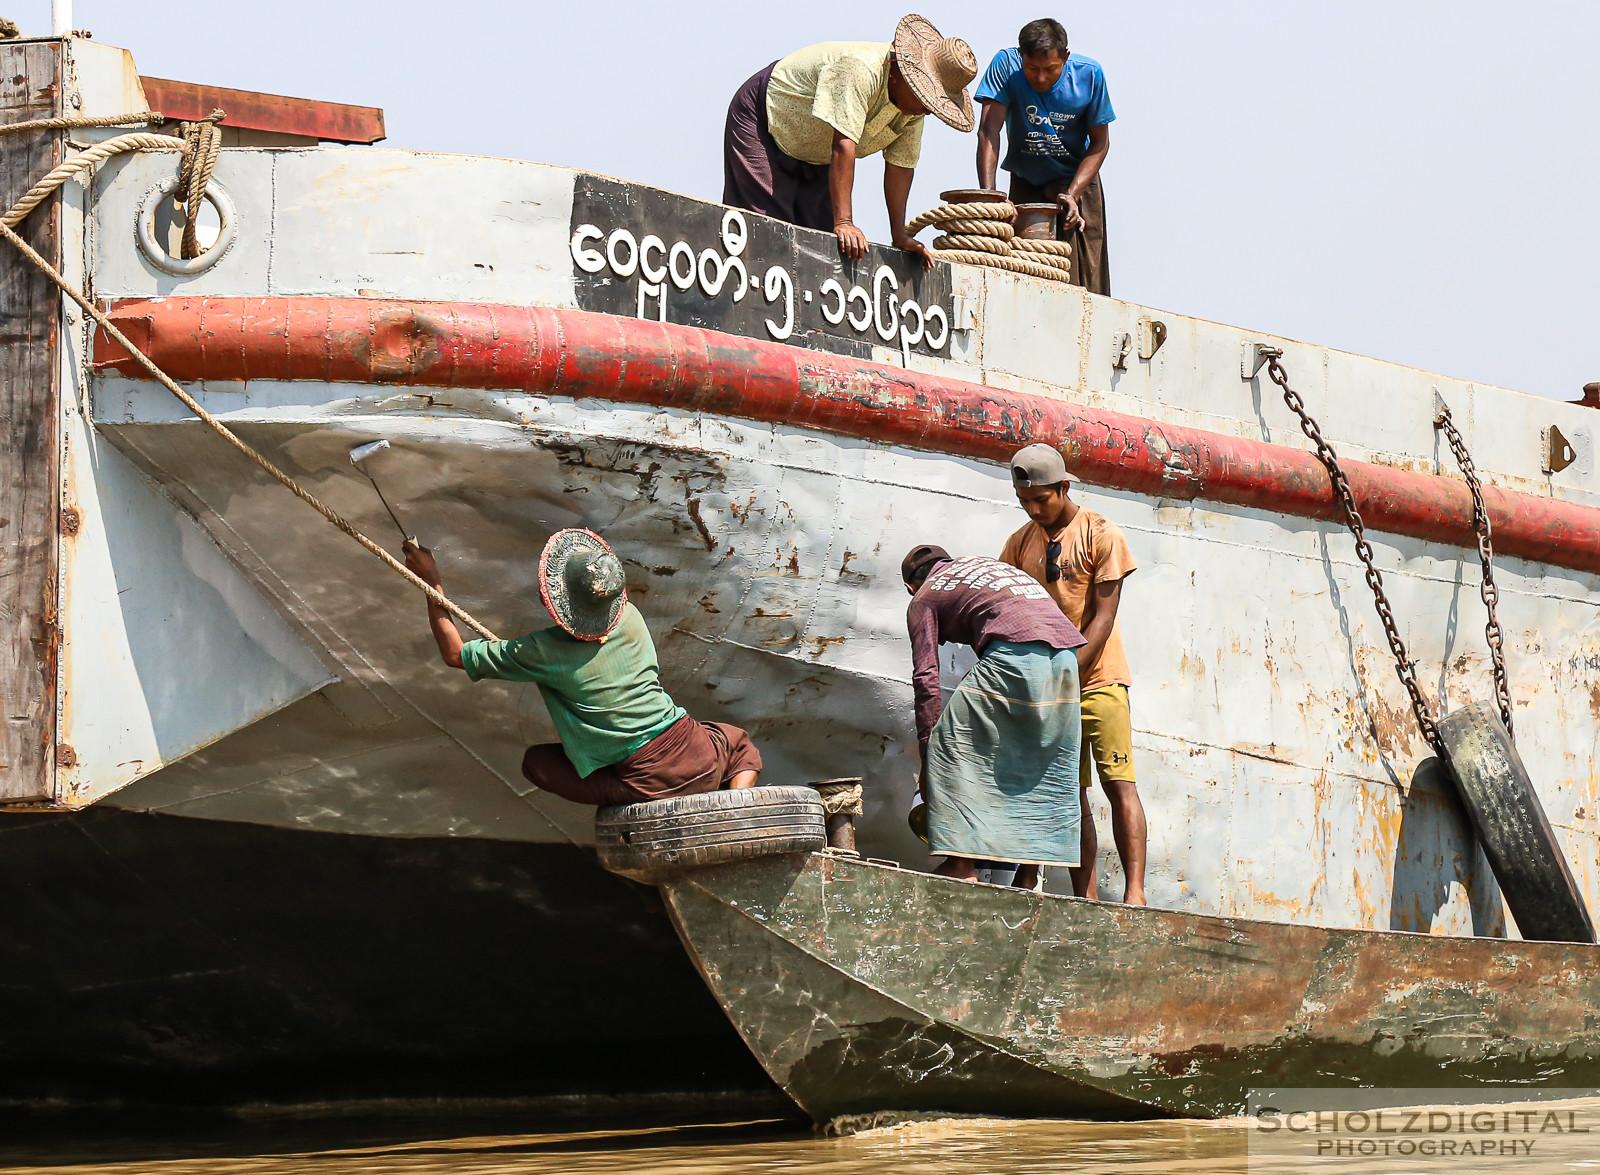 Schiff, Yangon, Werft, Renovierung ,Myanmar, Travelling,Asia, Bagan, Birma, Burma, Exploring, globetrotter, Irrawaddy, Mandalay, Southeastasia, Streetphotography, travel, Travelling, travelphotography, Wanderlust